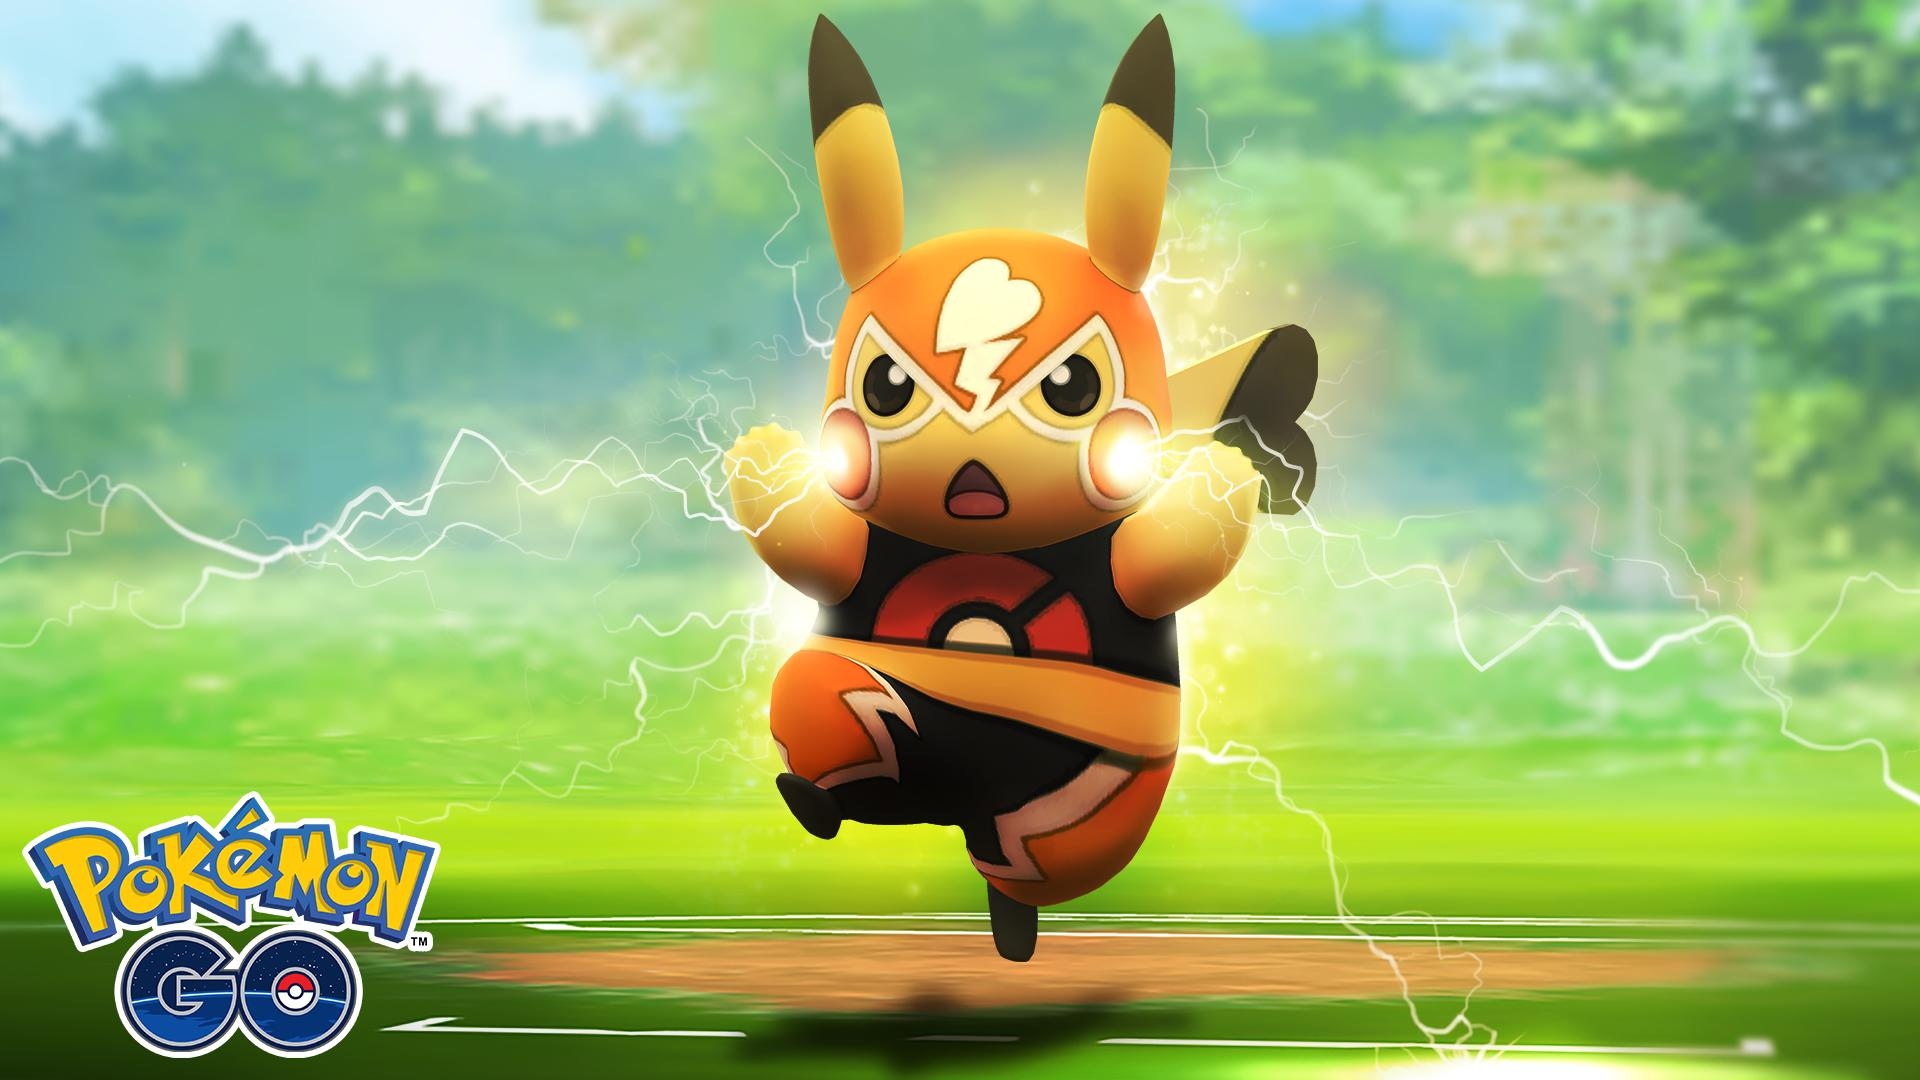 Pokémon GO 0.195.2 - Download for PC Free